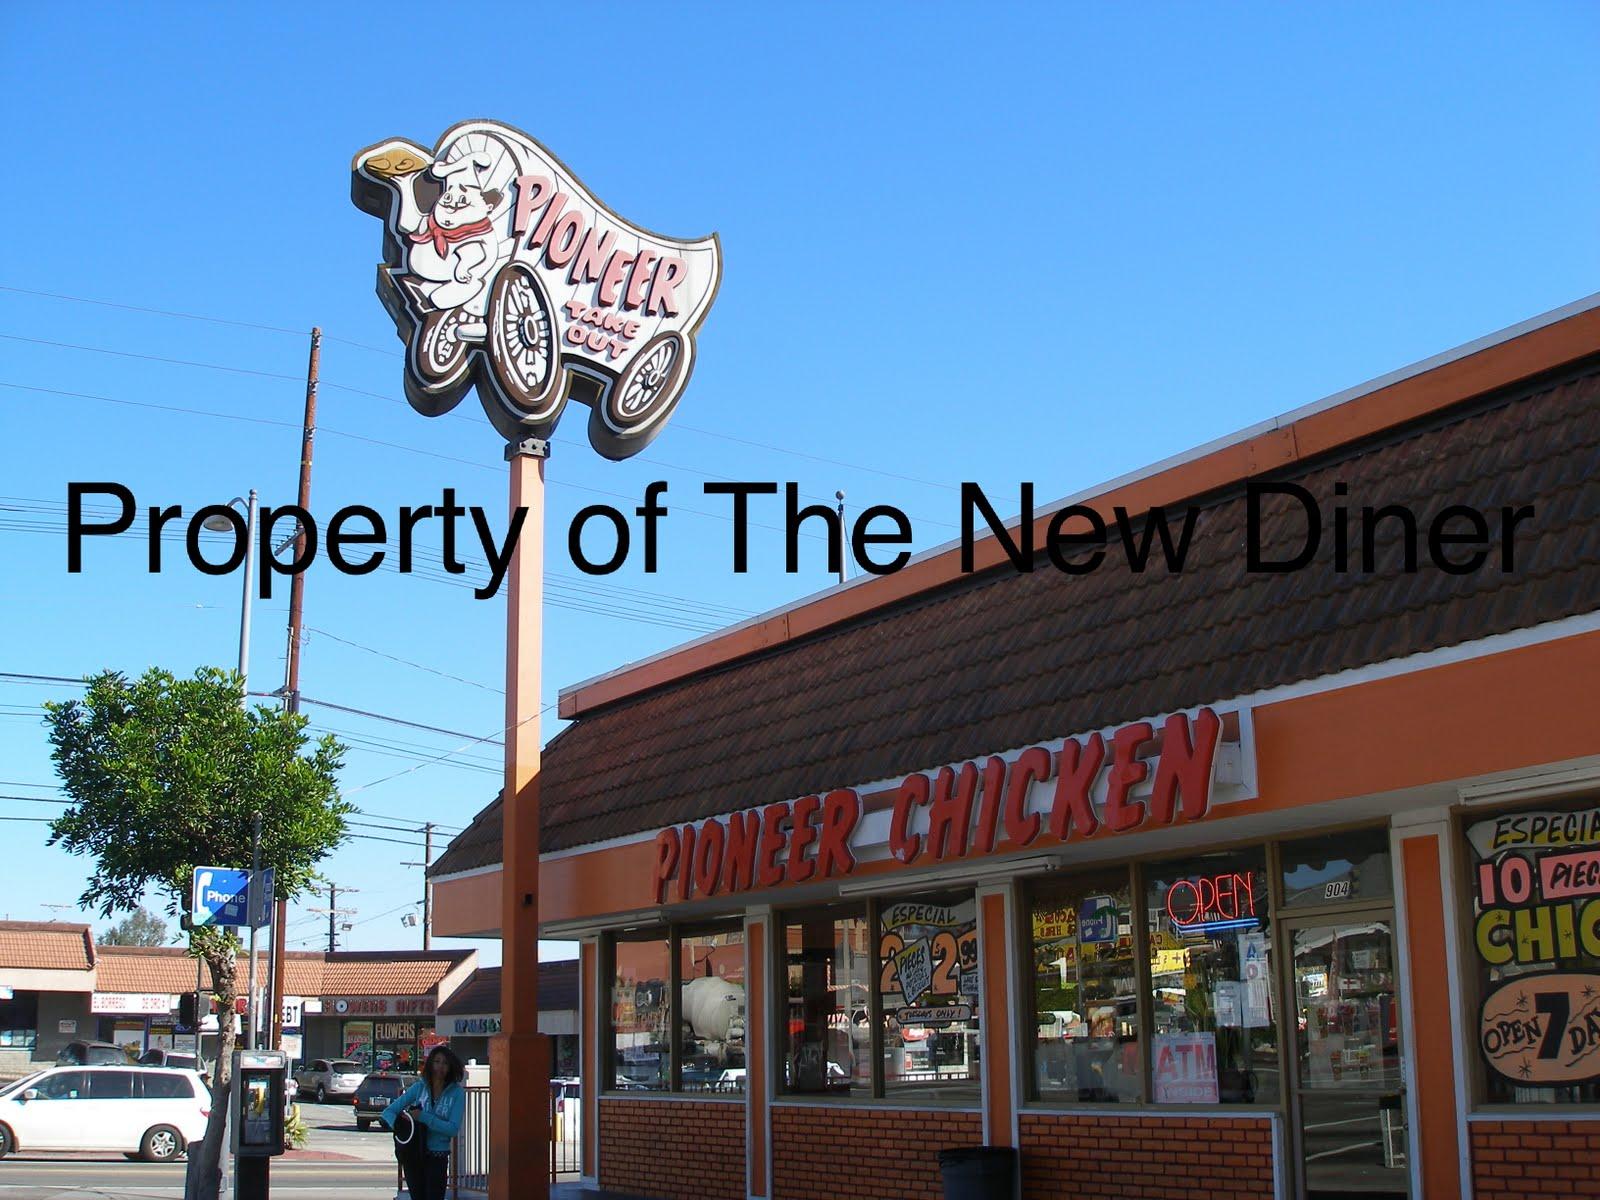 The New Diner: Pioneer Chicken- Soto St.